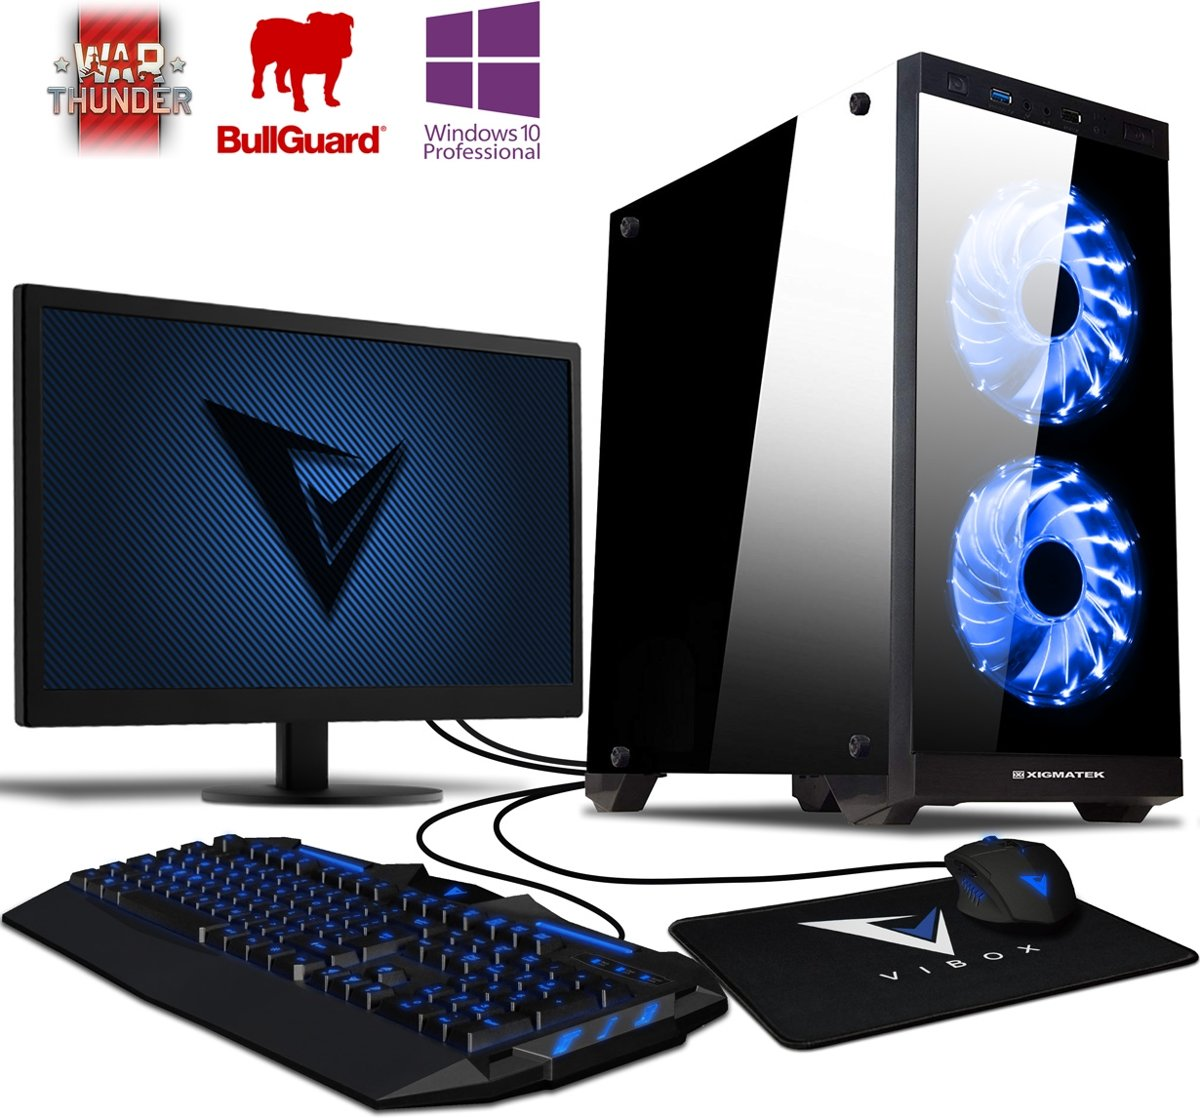 Vibox Gaming Desktop Killstreak GS780-60 - Game PC